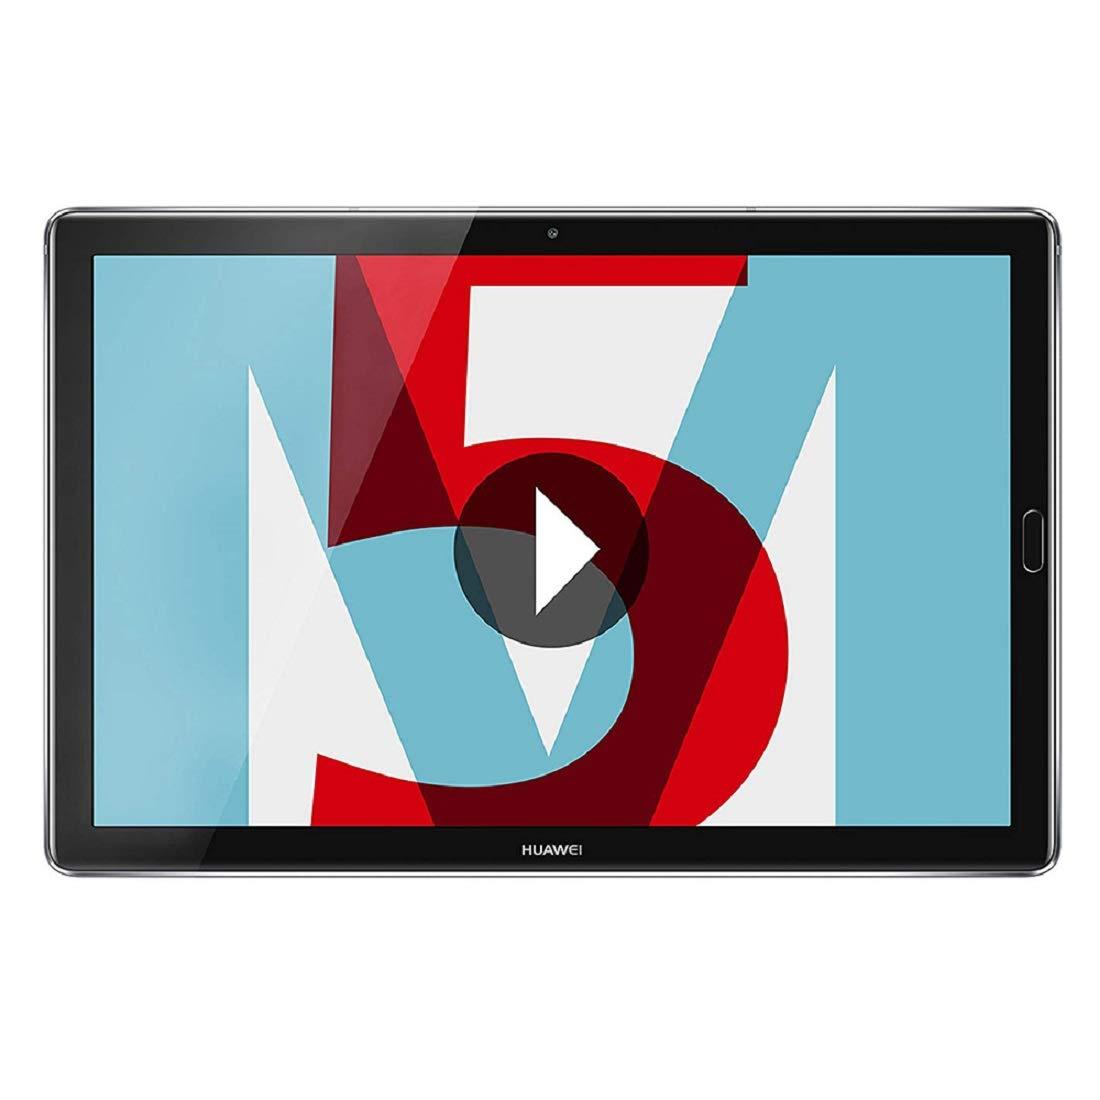 "Tablette tactile 10.8"" Huawei MediaPad M5 - QHD+, Kirin 960, 4 Go de RAM, 32 Go, Wi-Fi"